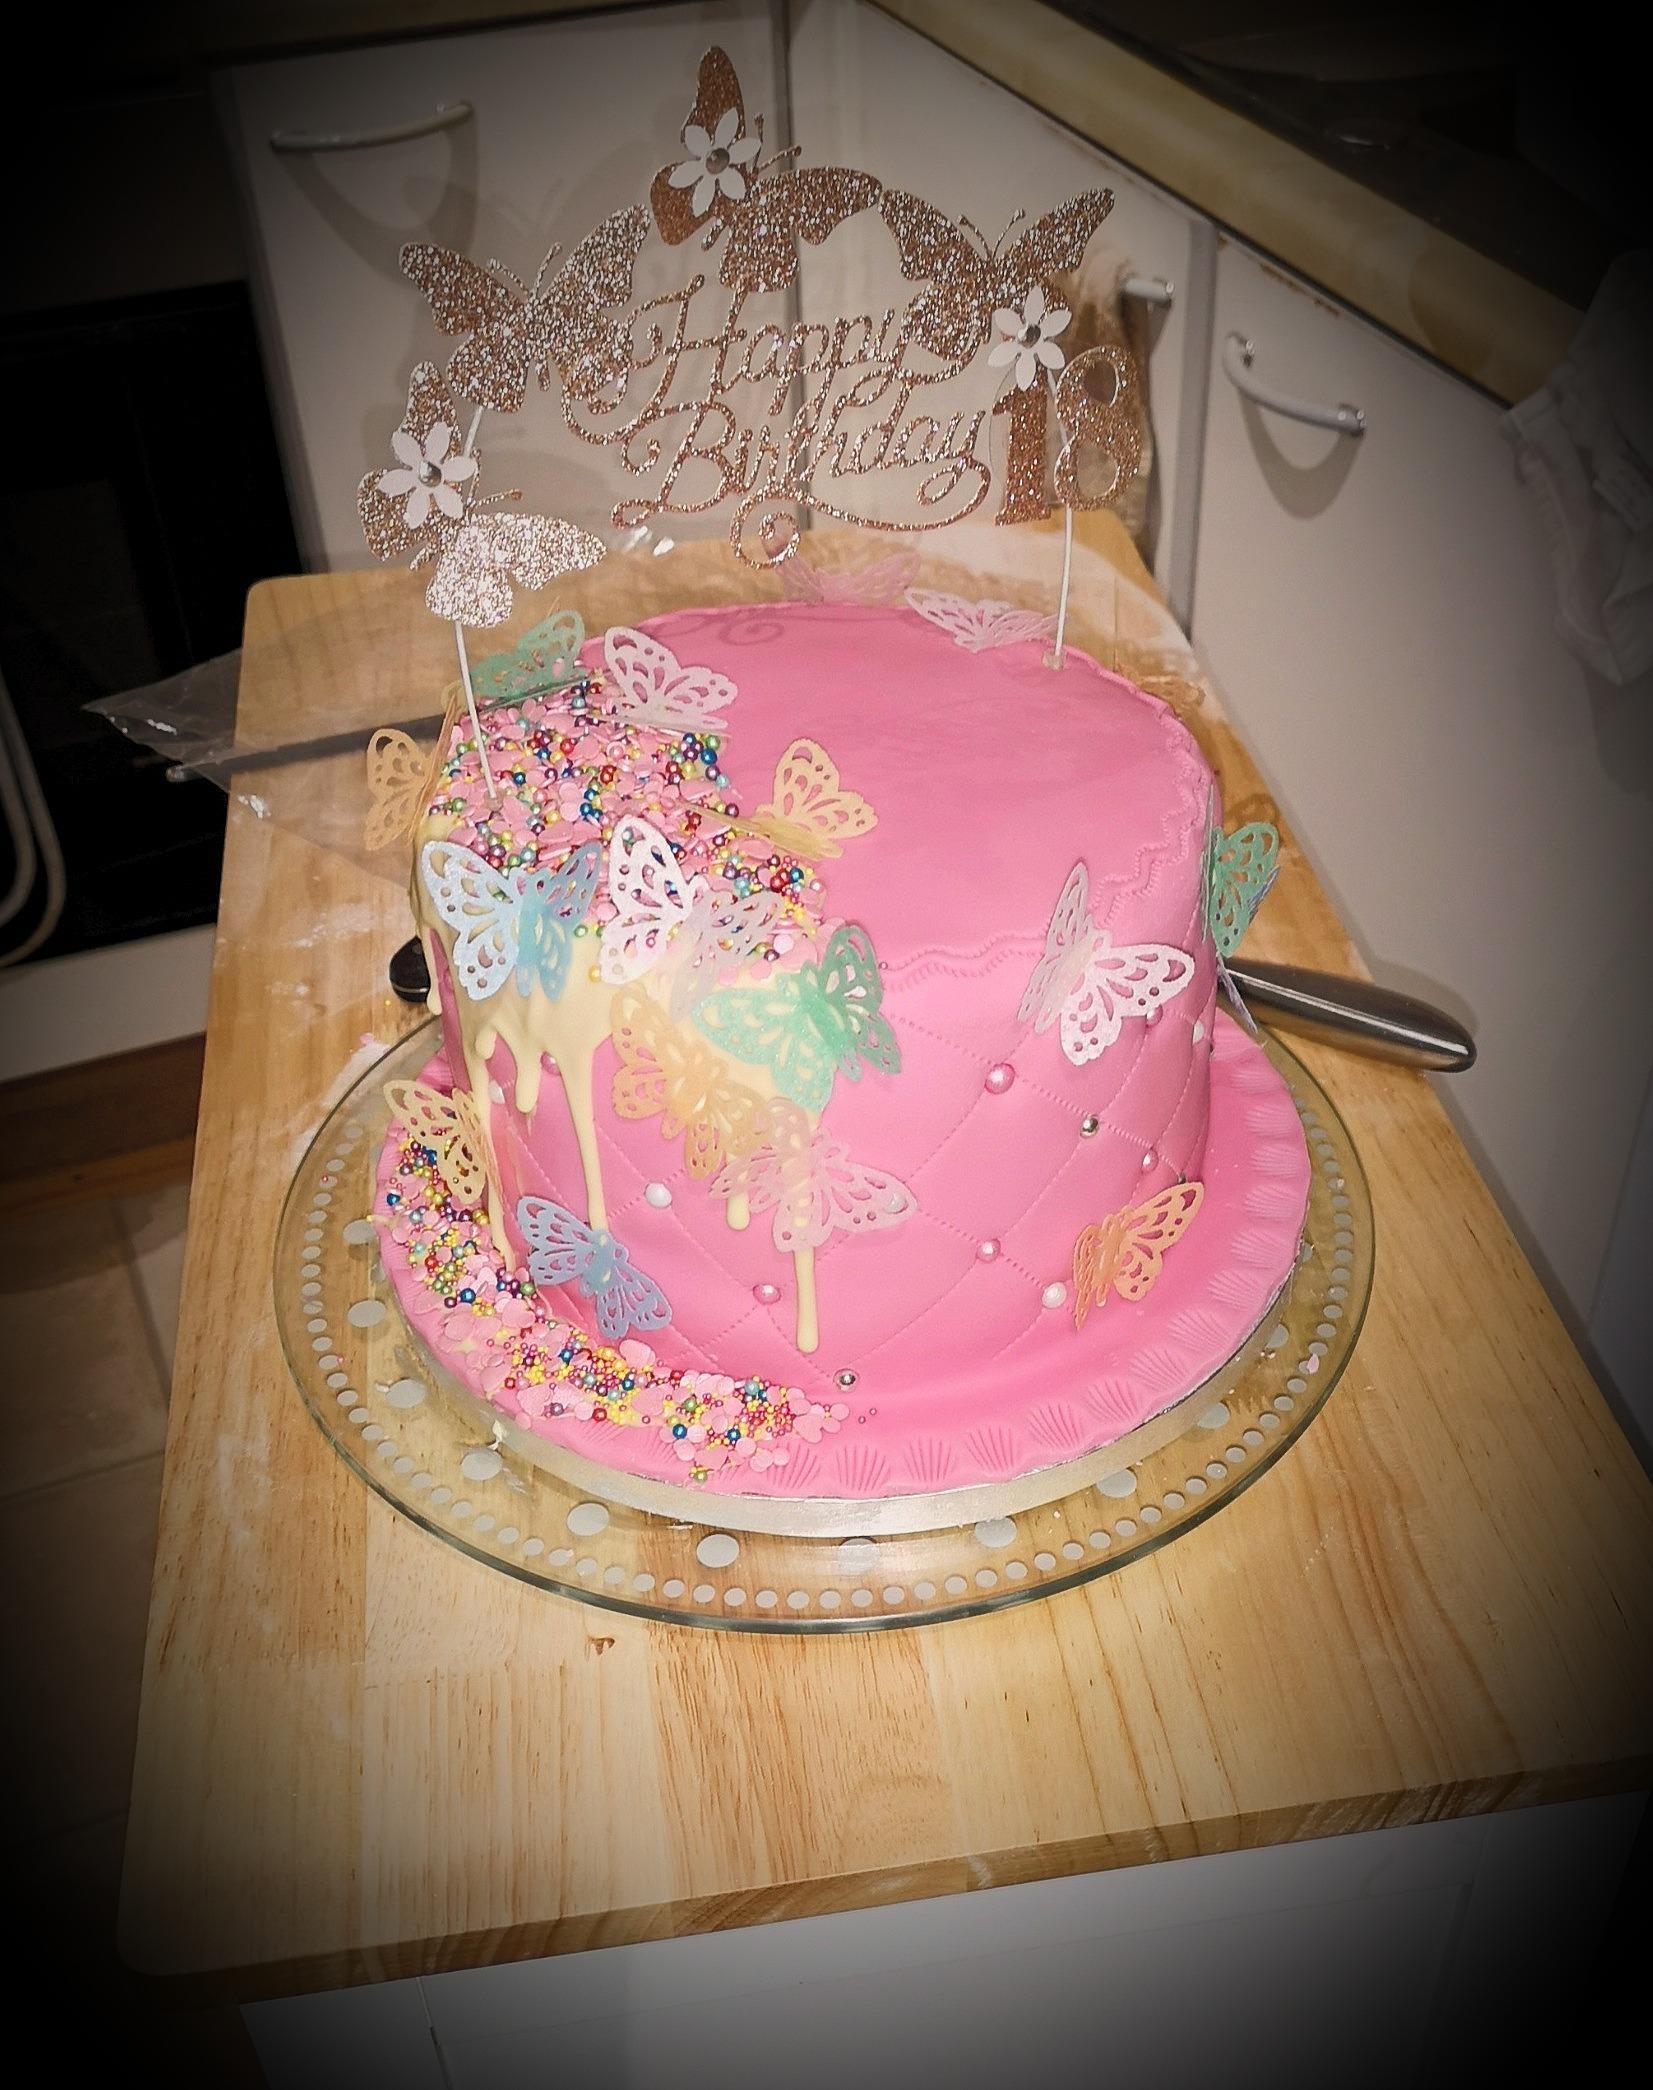 Celebration Cake (Topper not included)